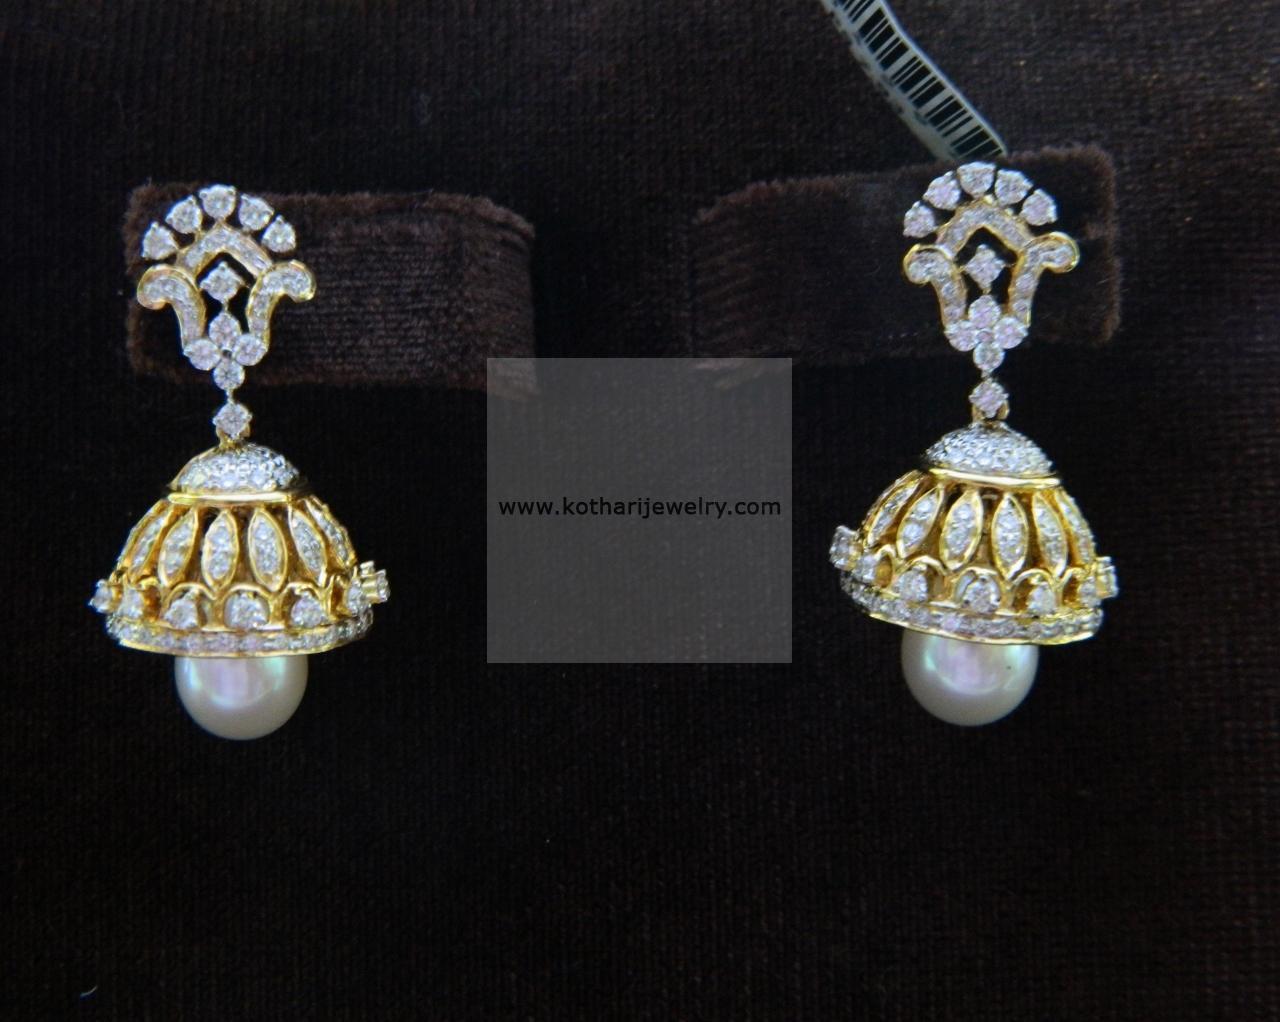 18kt South Indian Diamond Jhumki